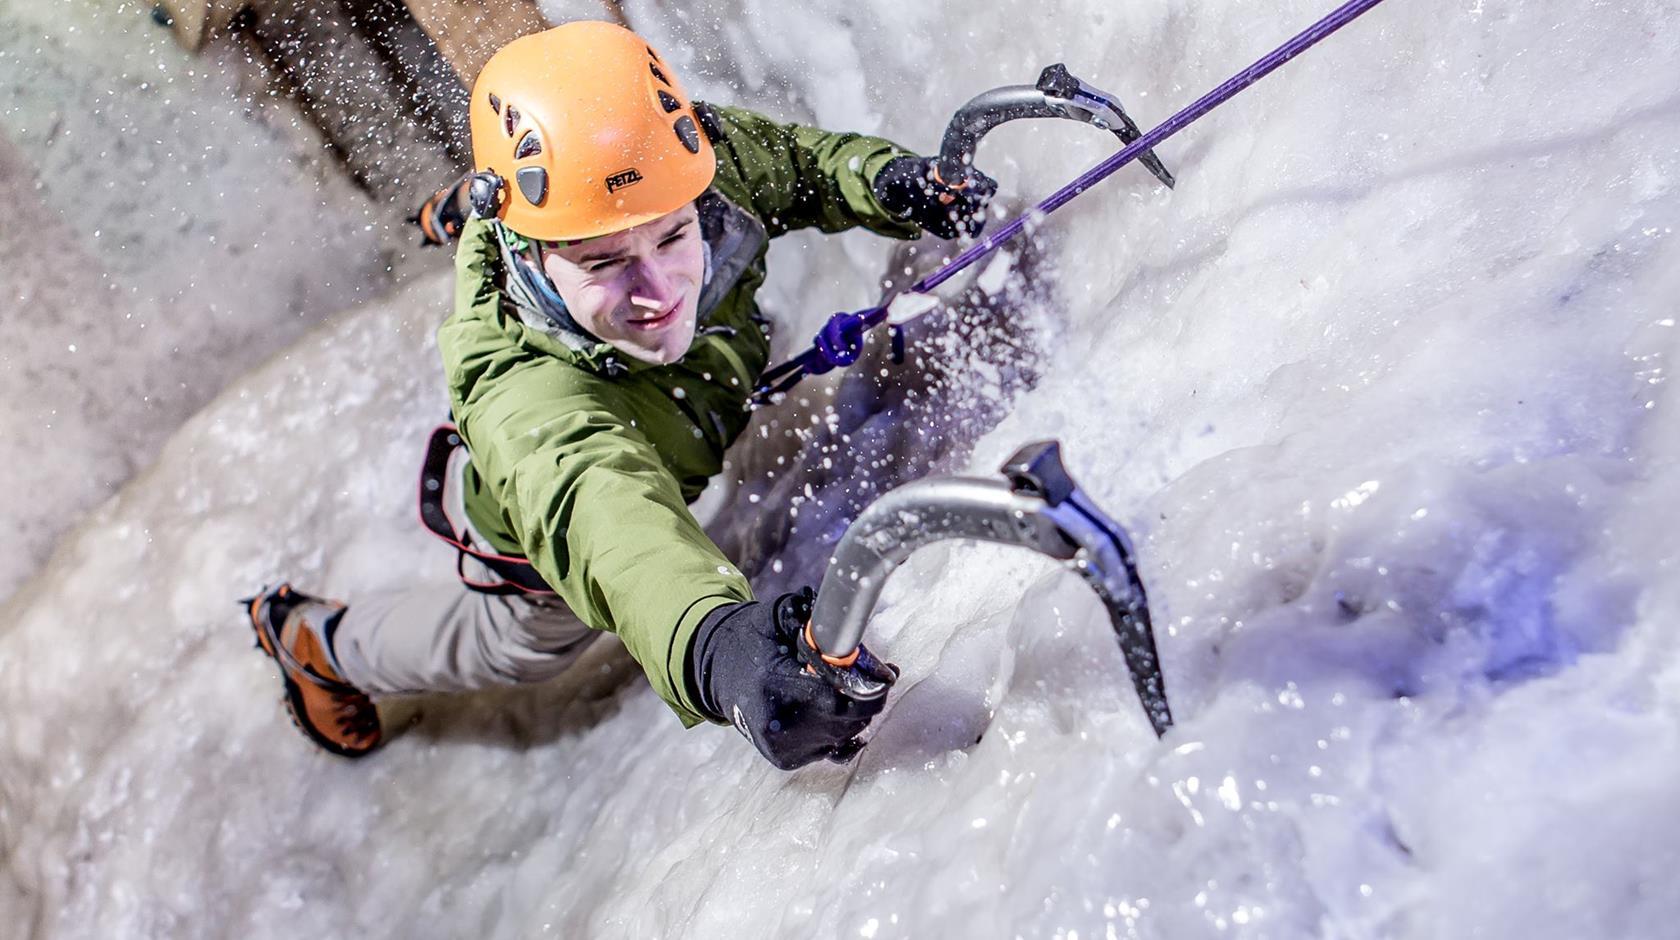 35374-vertical-chill-ice-wall-manchester-manchester-01.jpg